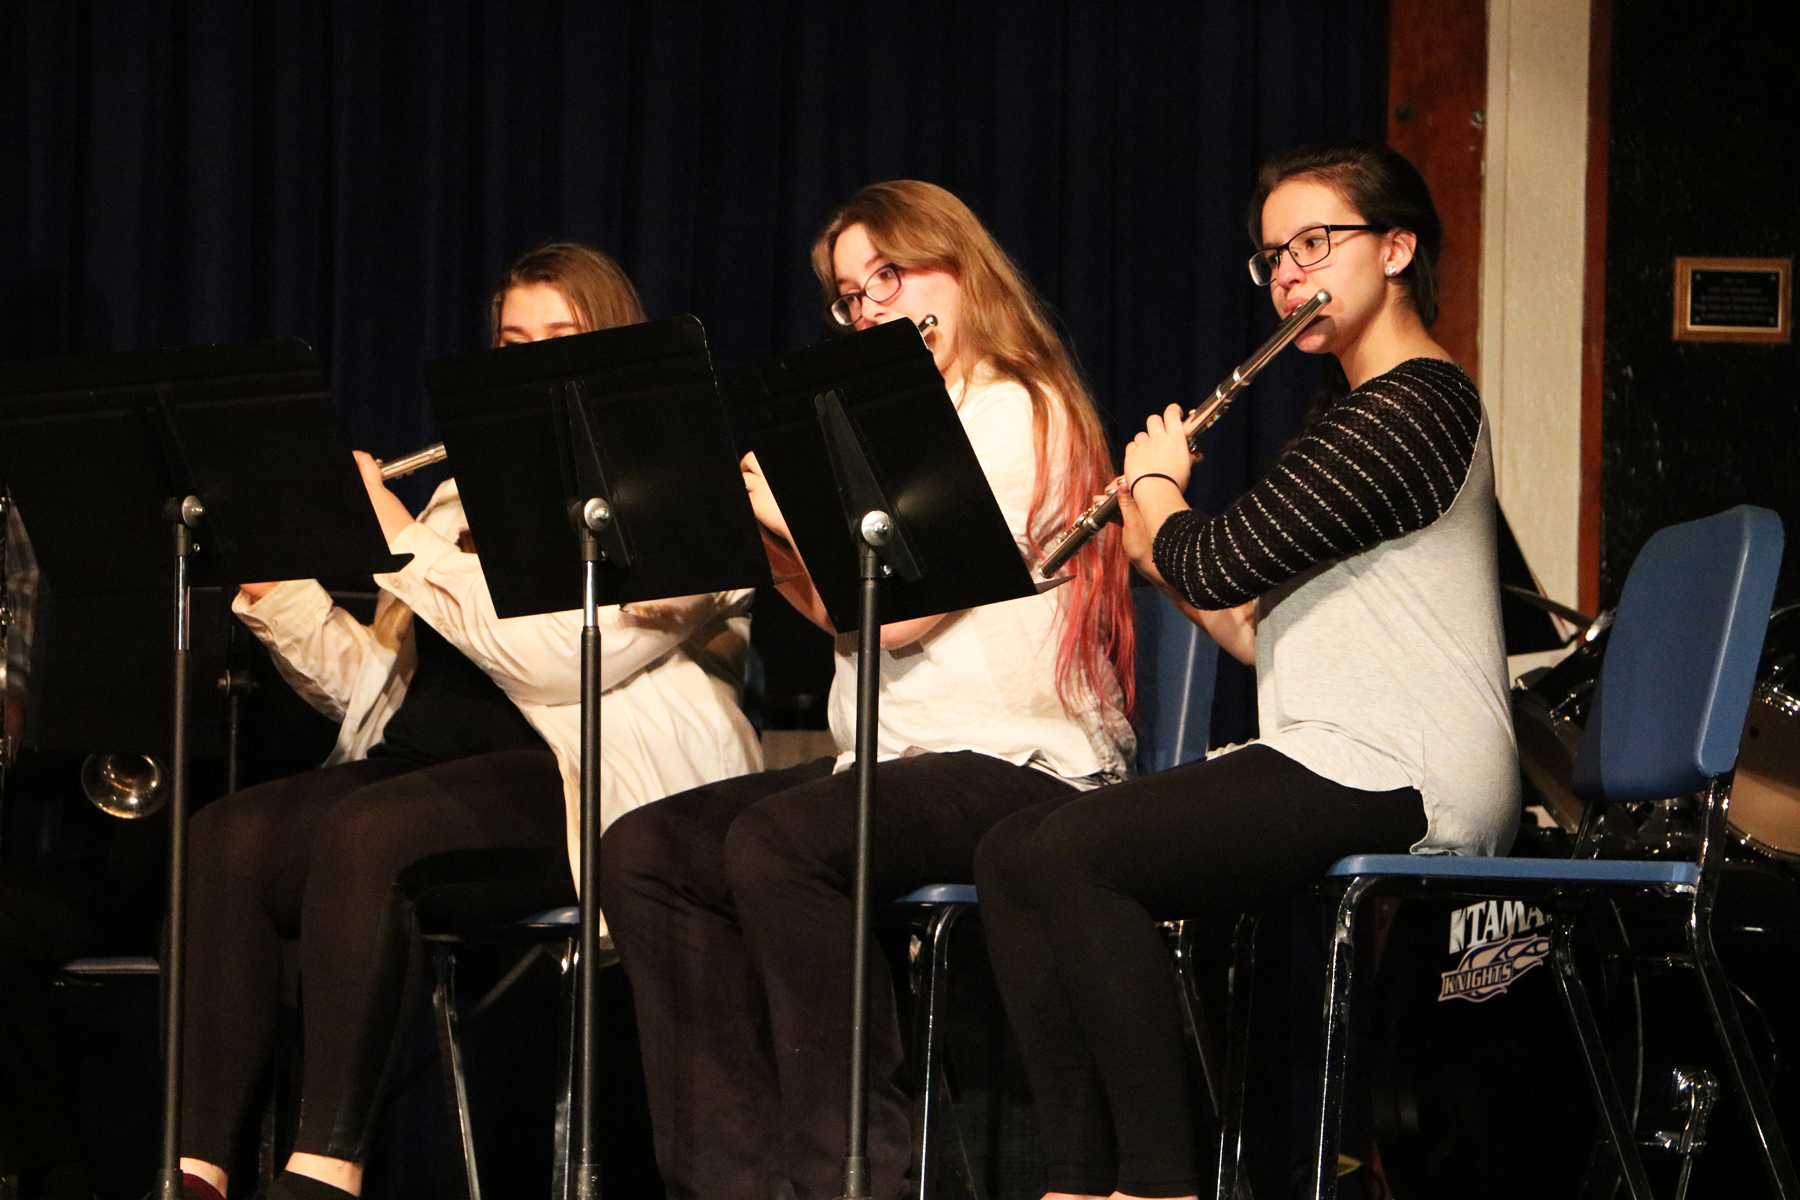 Music & Entertaiment